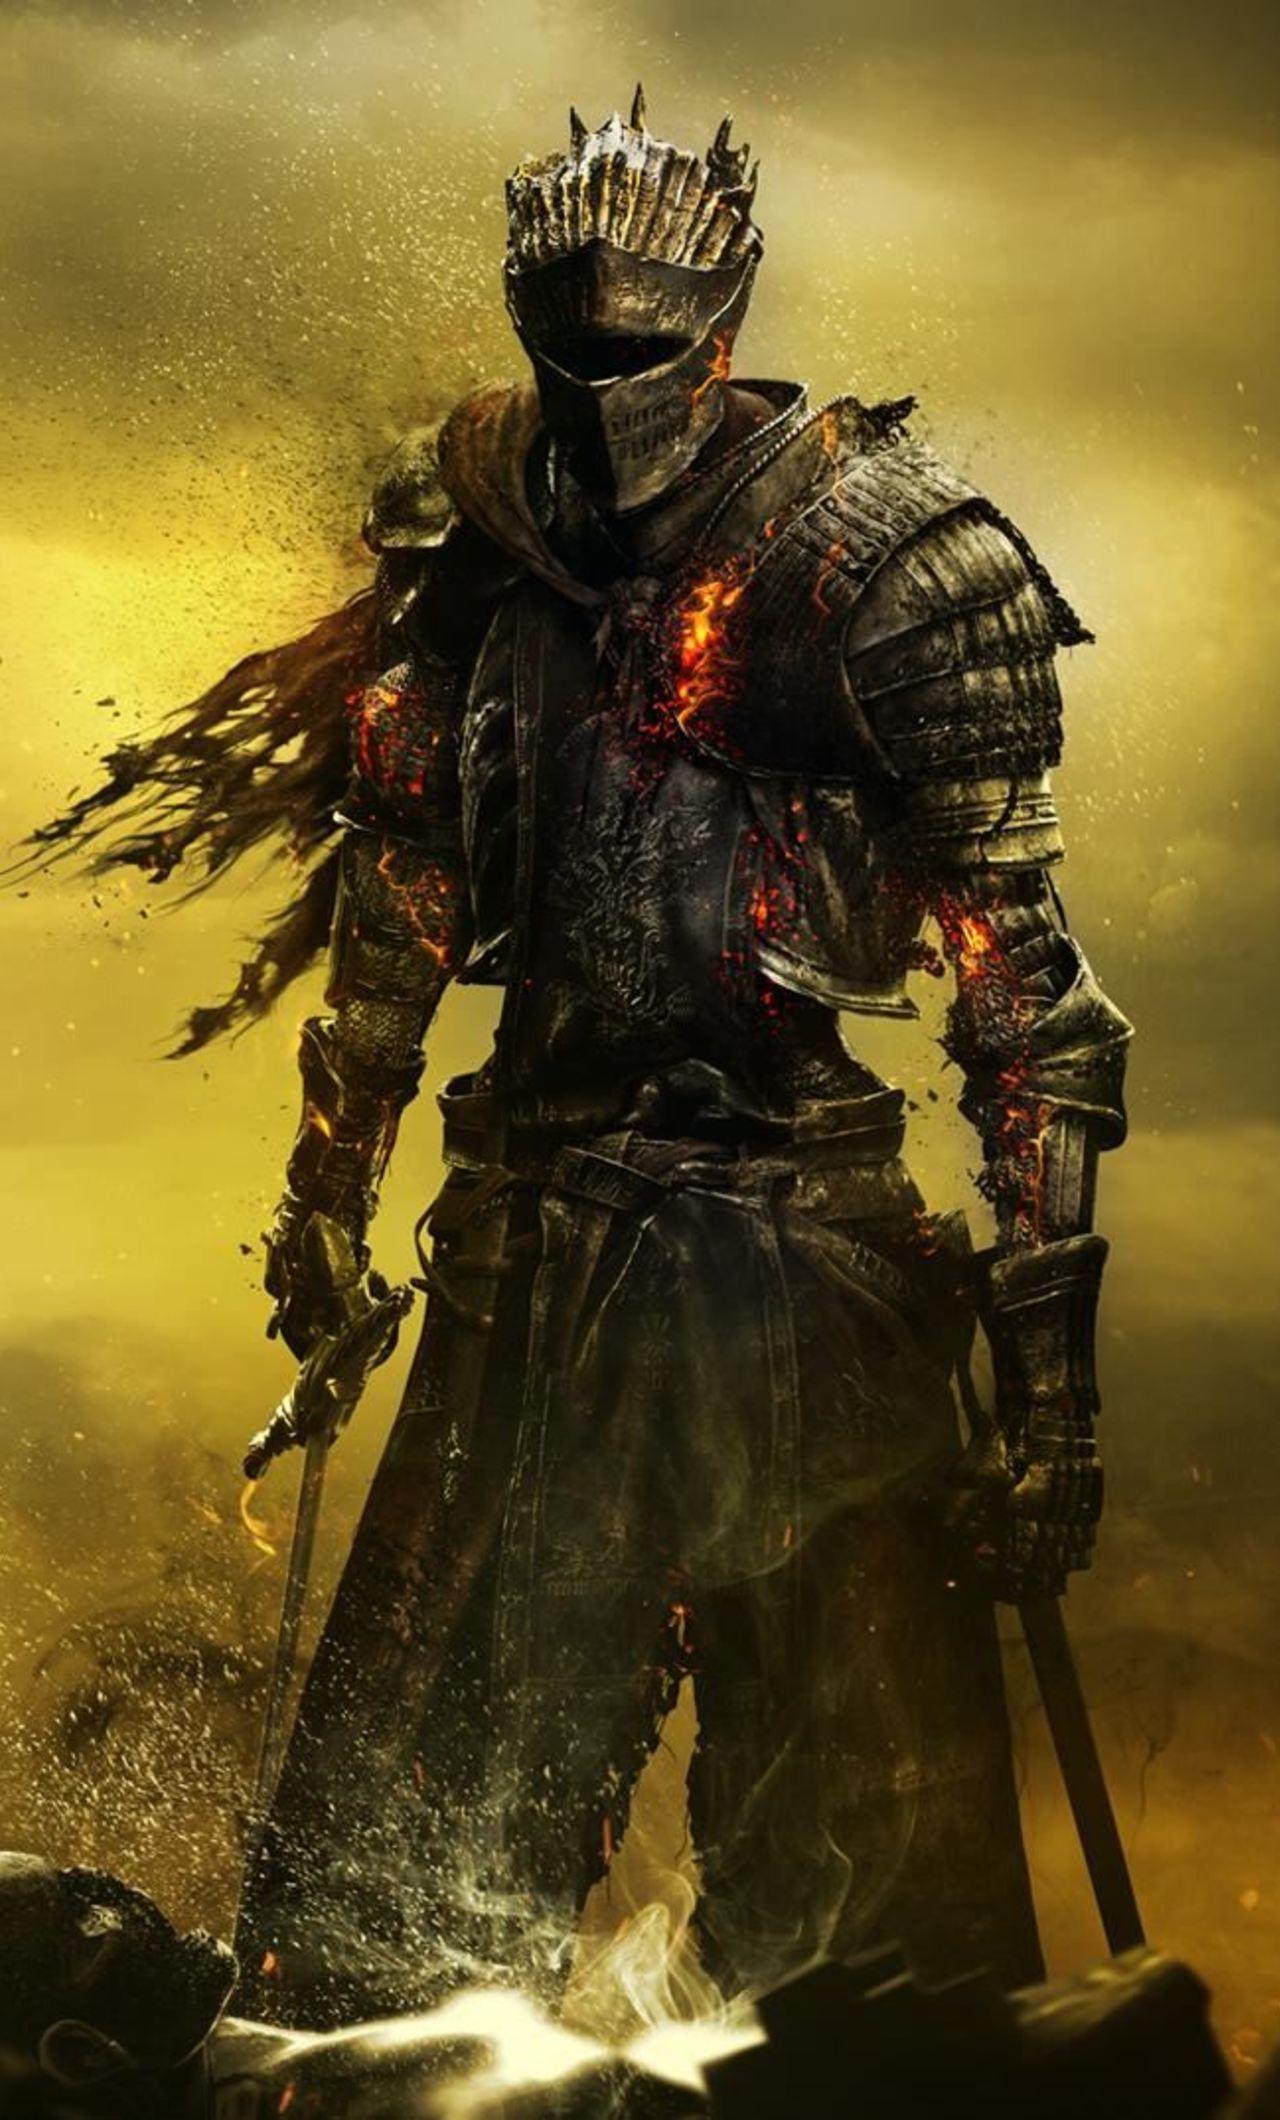 Dark Souls Iphone Wallpapers Top Free Dark Souls Iphone